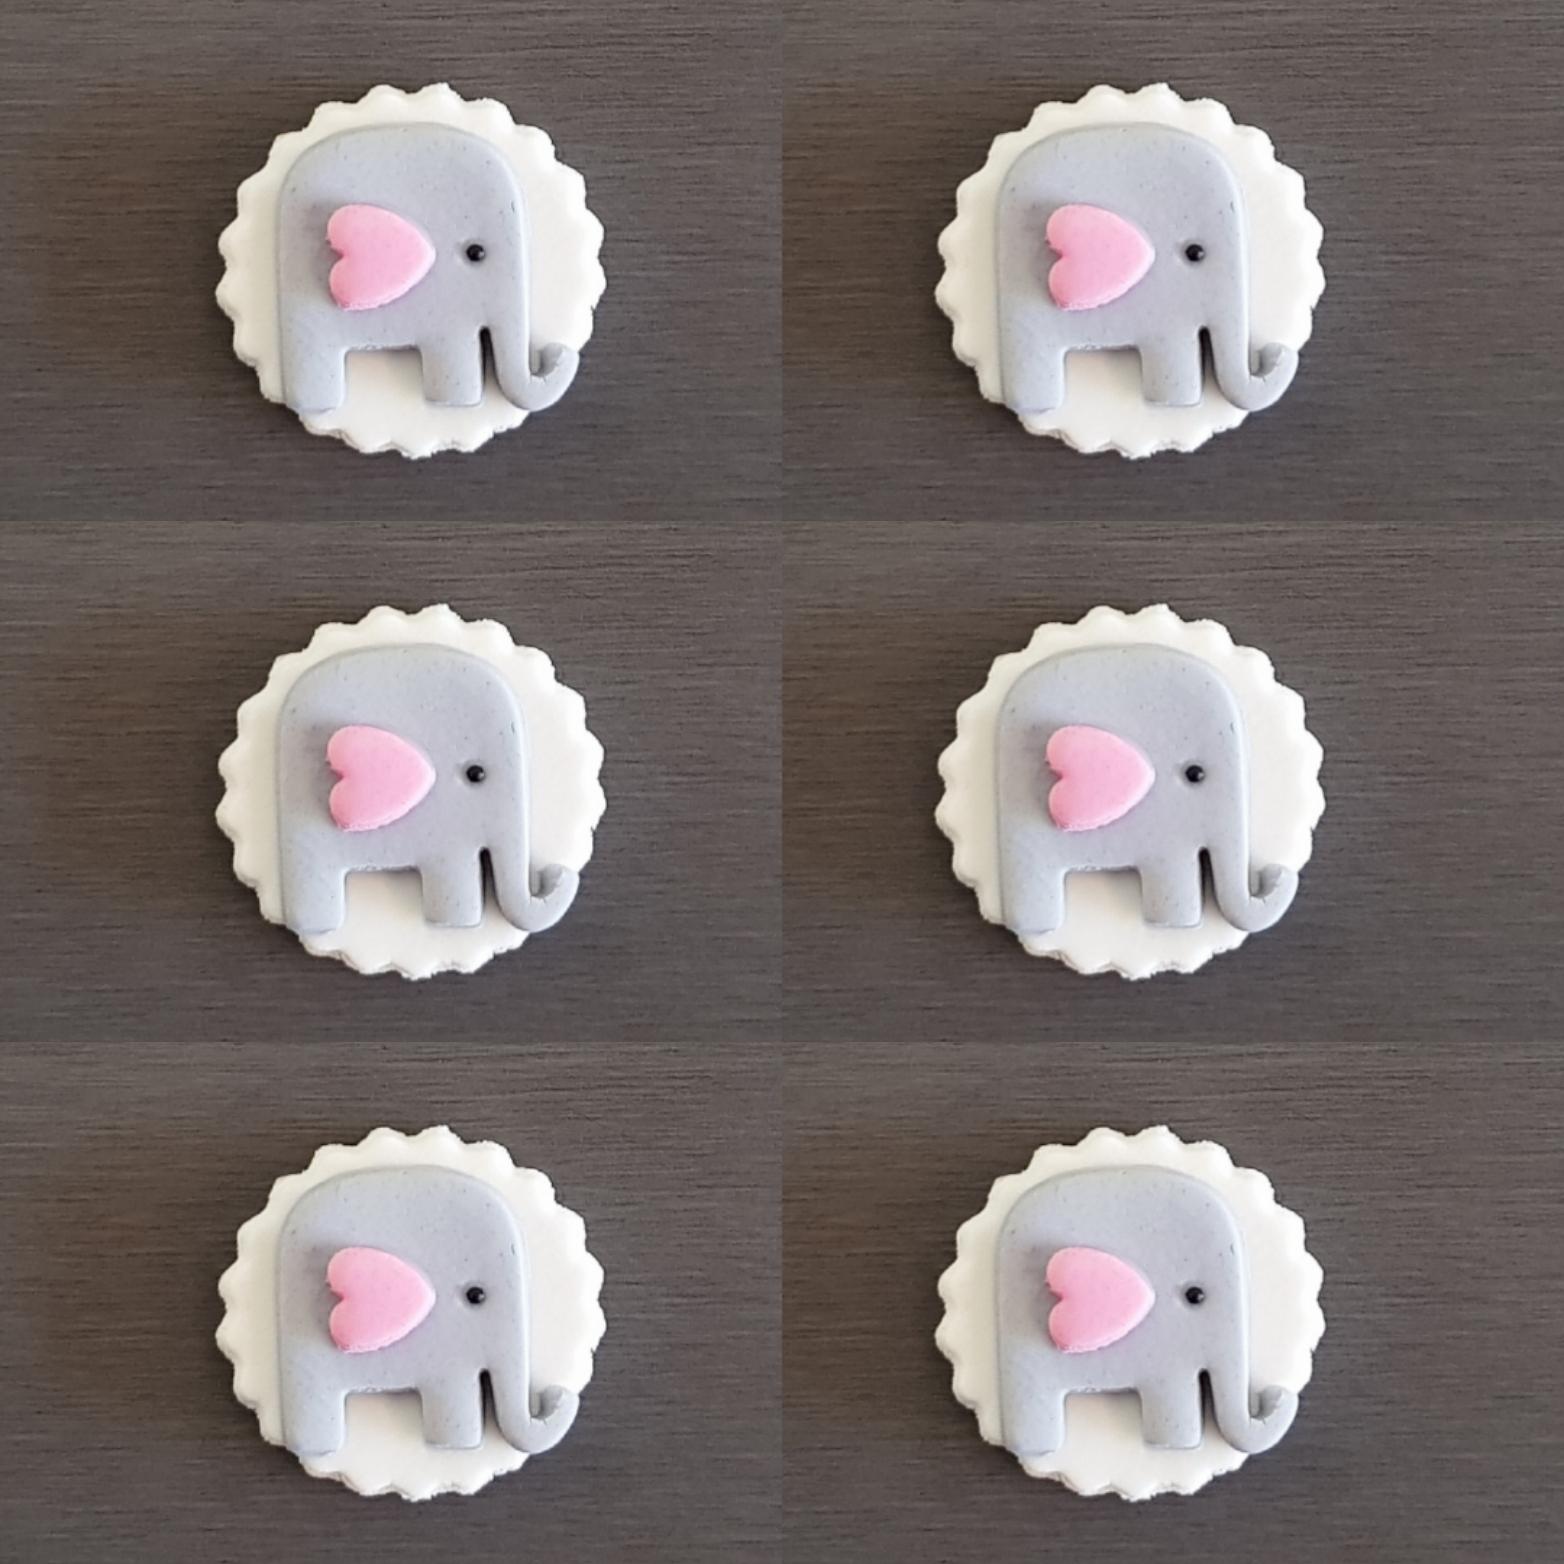 Edible 3D Fox Animals Cupcake Toppers Edible Sugar Cake Decoration